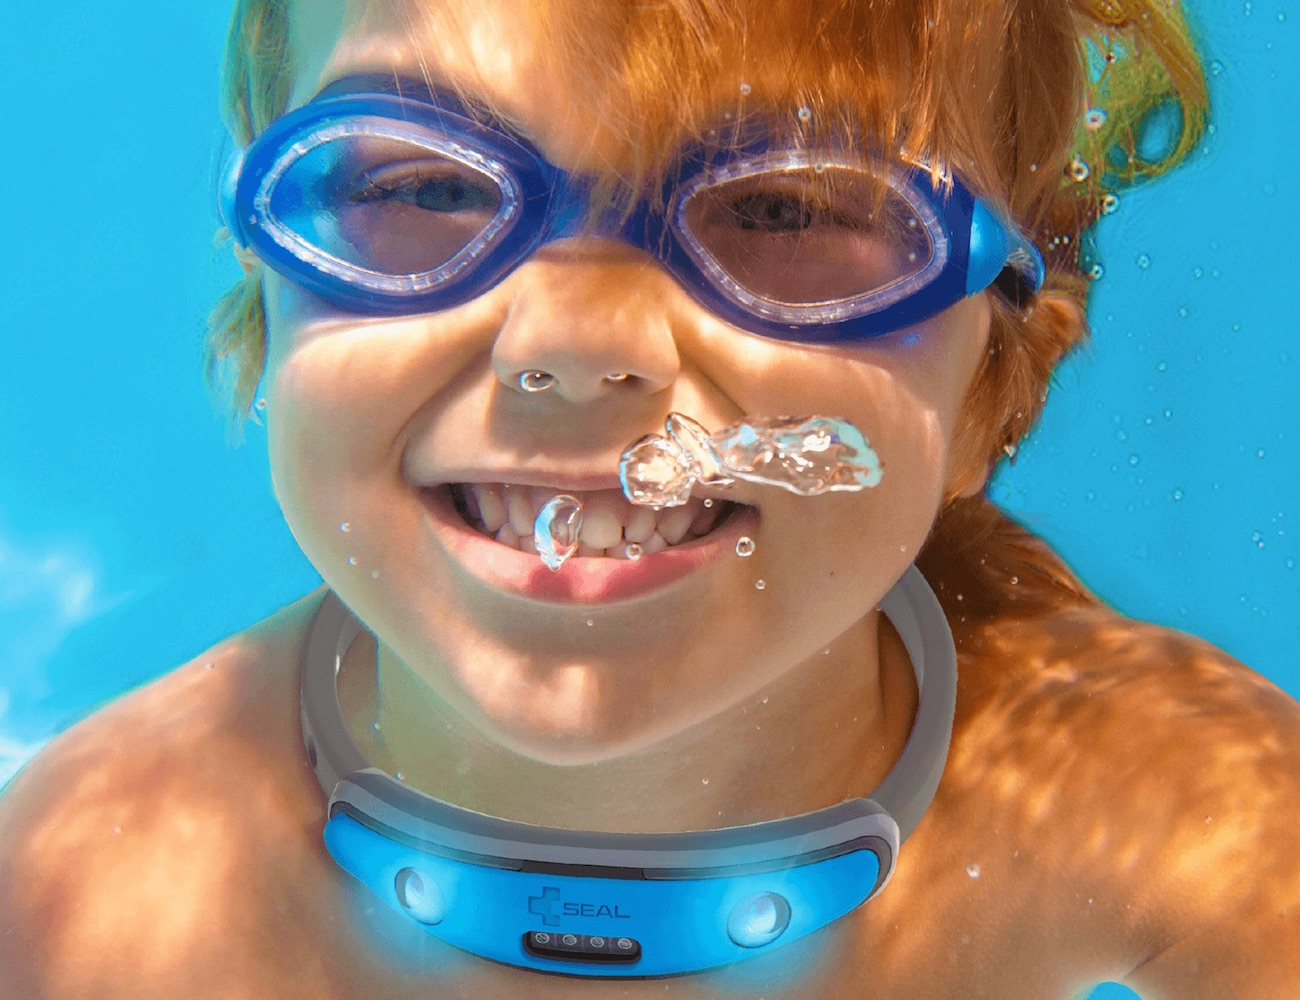 SwimSafe Swim Monitor System by SEAL